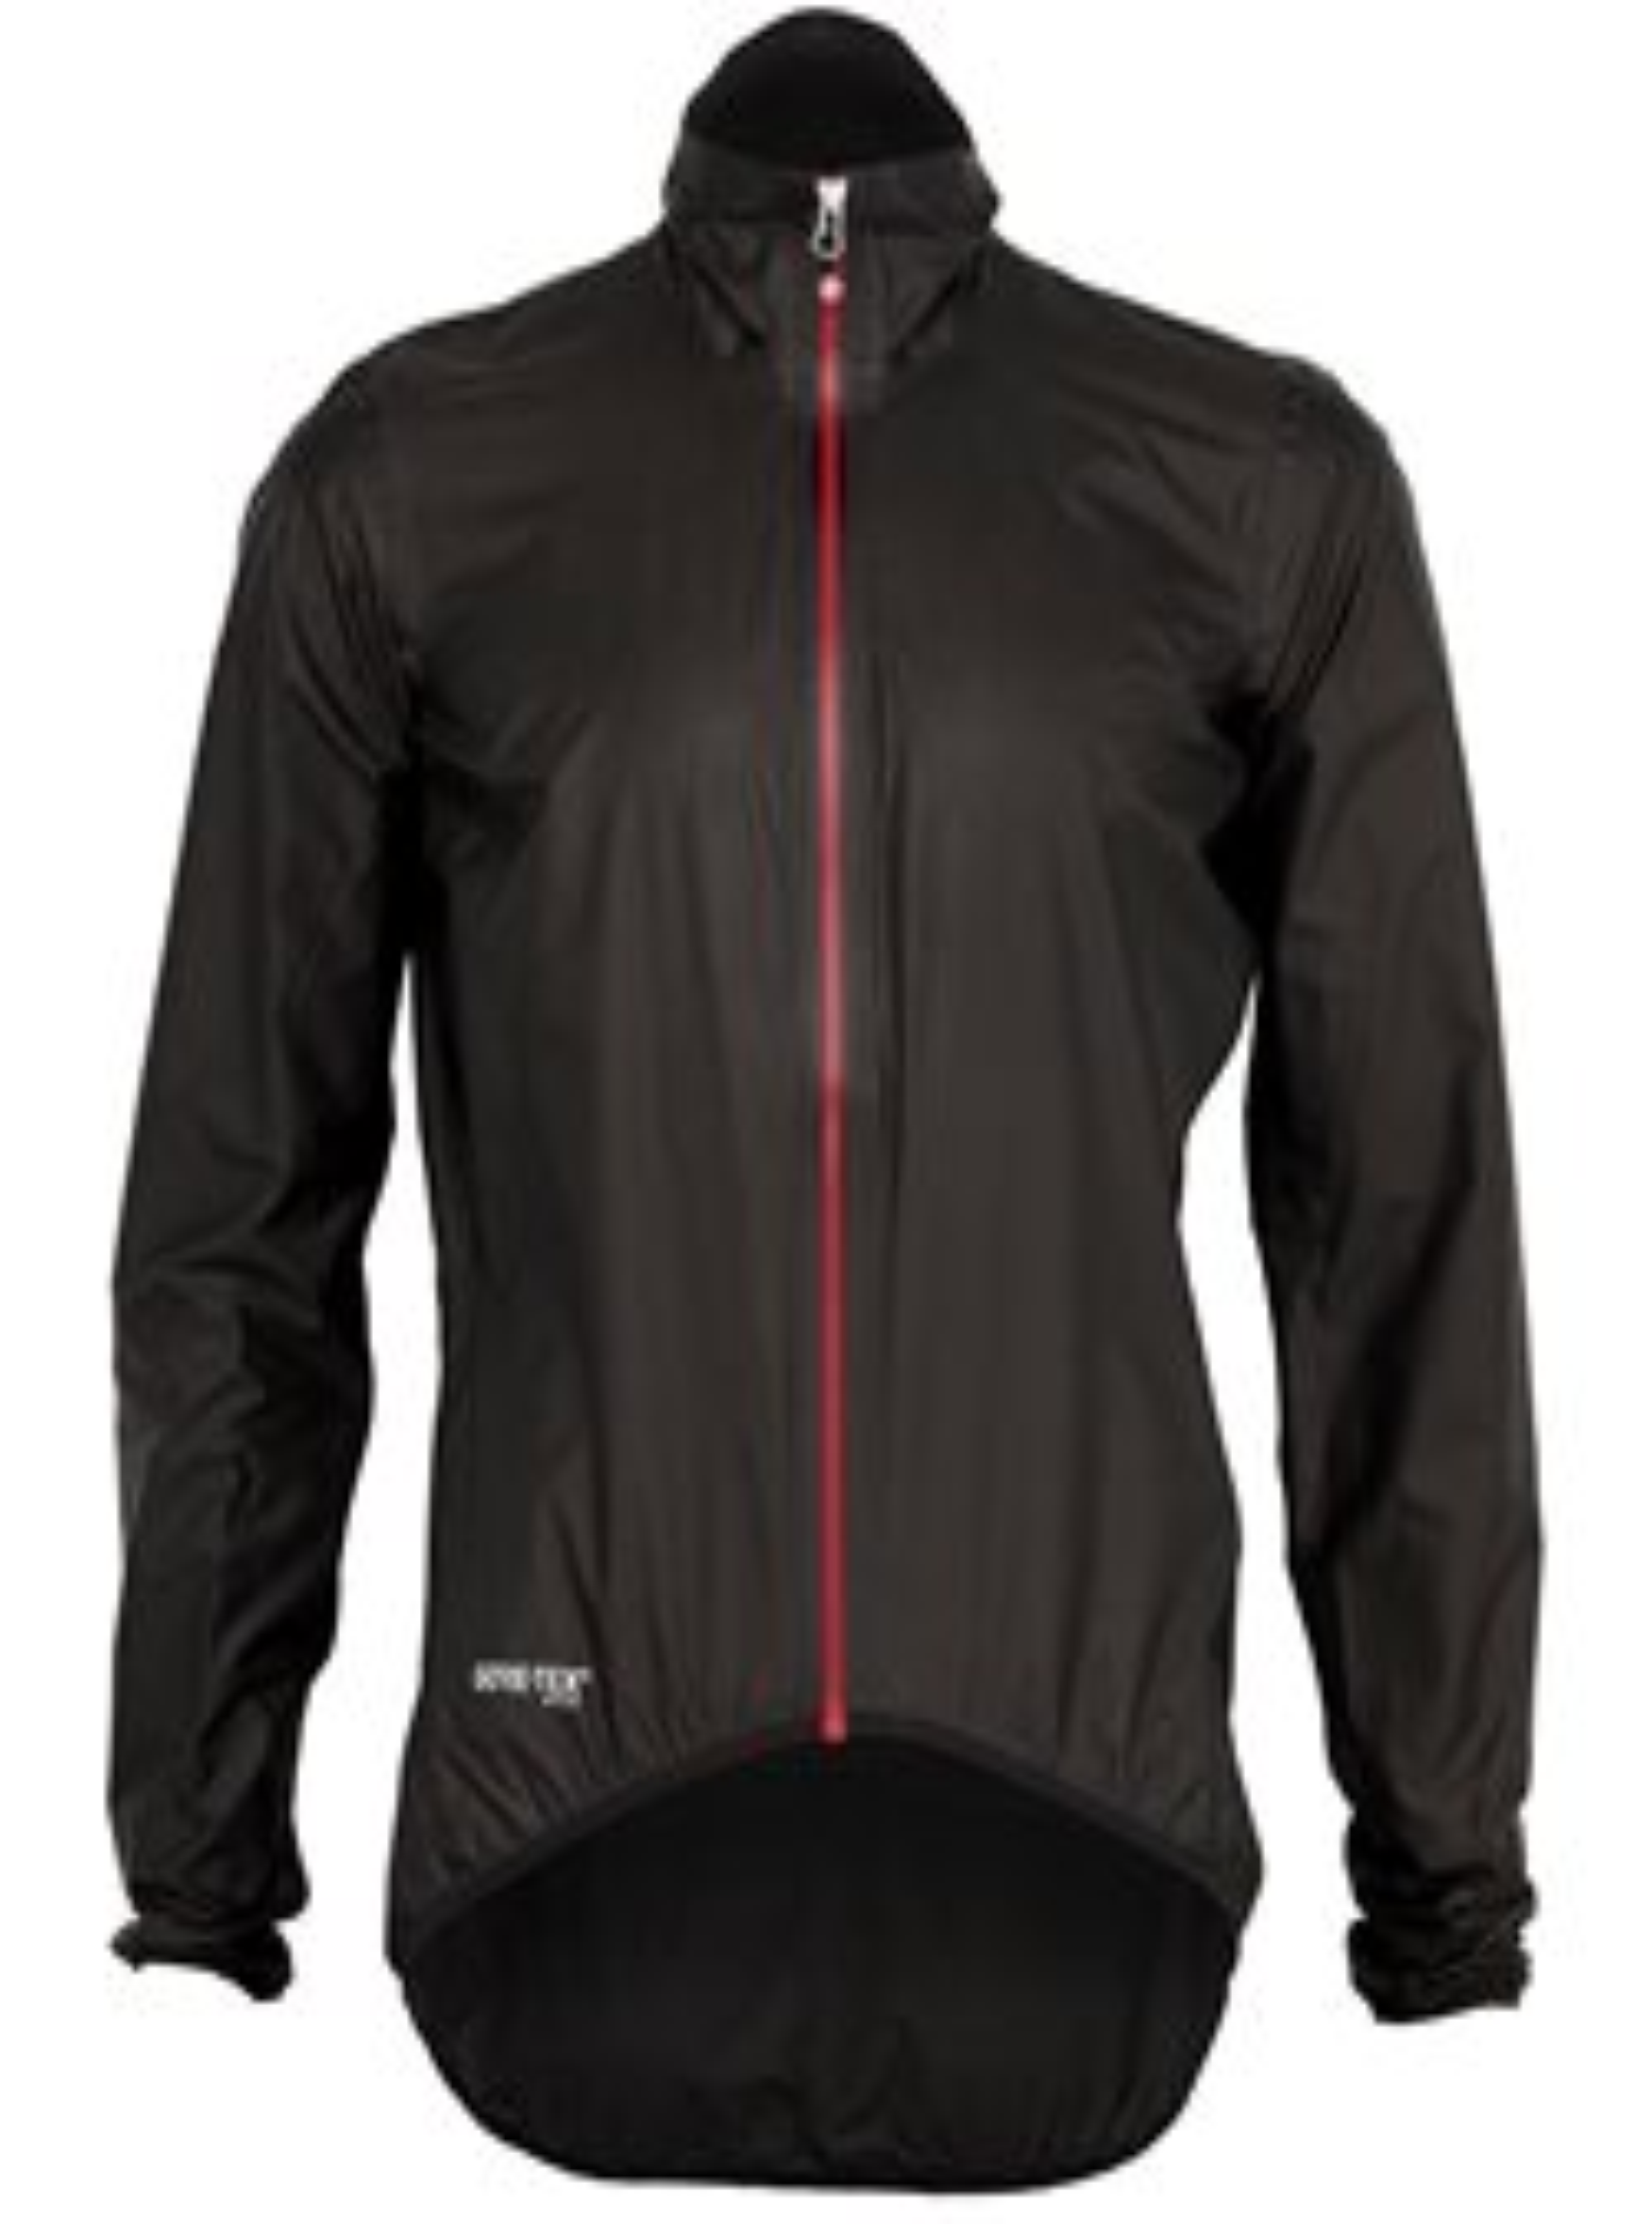 Castelli Idro 2 Cycling Rain Jacket